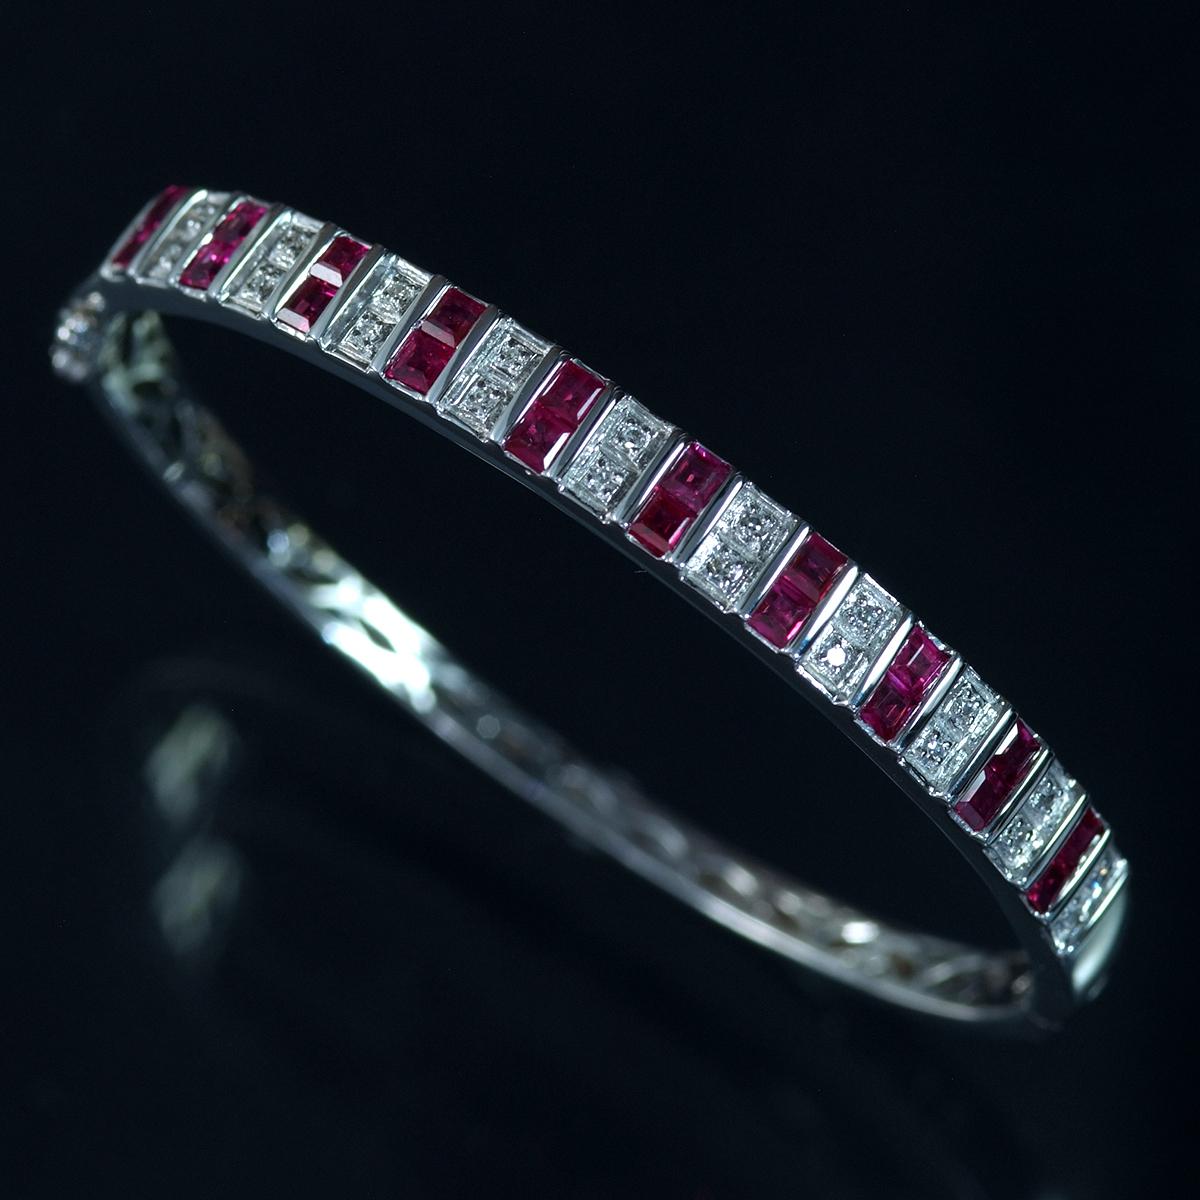 F0241 美しいルビー2.64ct 天然絶品ダイヤモンド0.12ct 最高級14金WG無垢バングル 腕周り15.5cm 重量15.06g 縦幅6.09mm_画像1